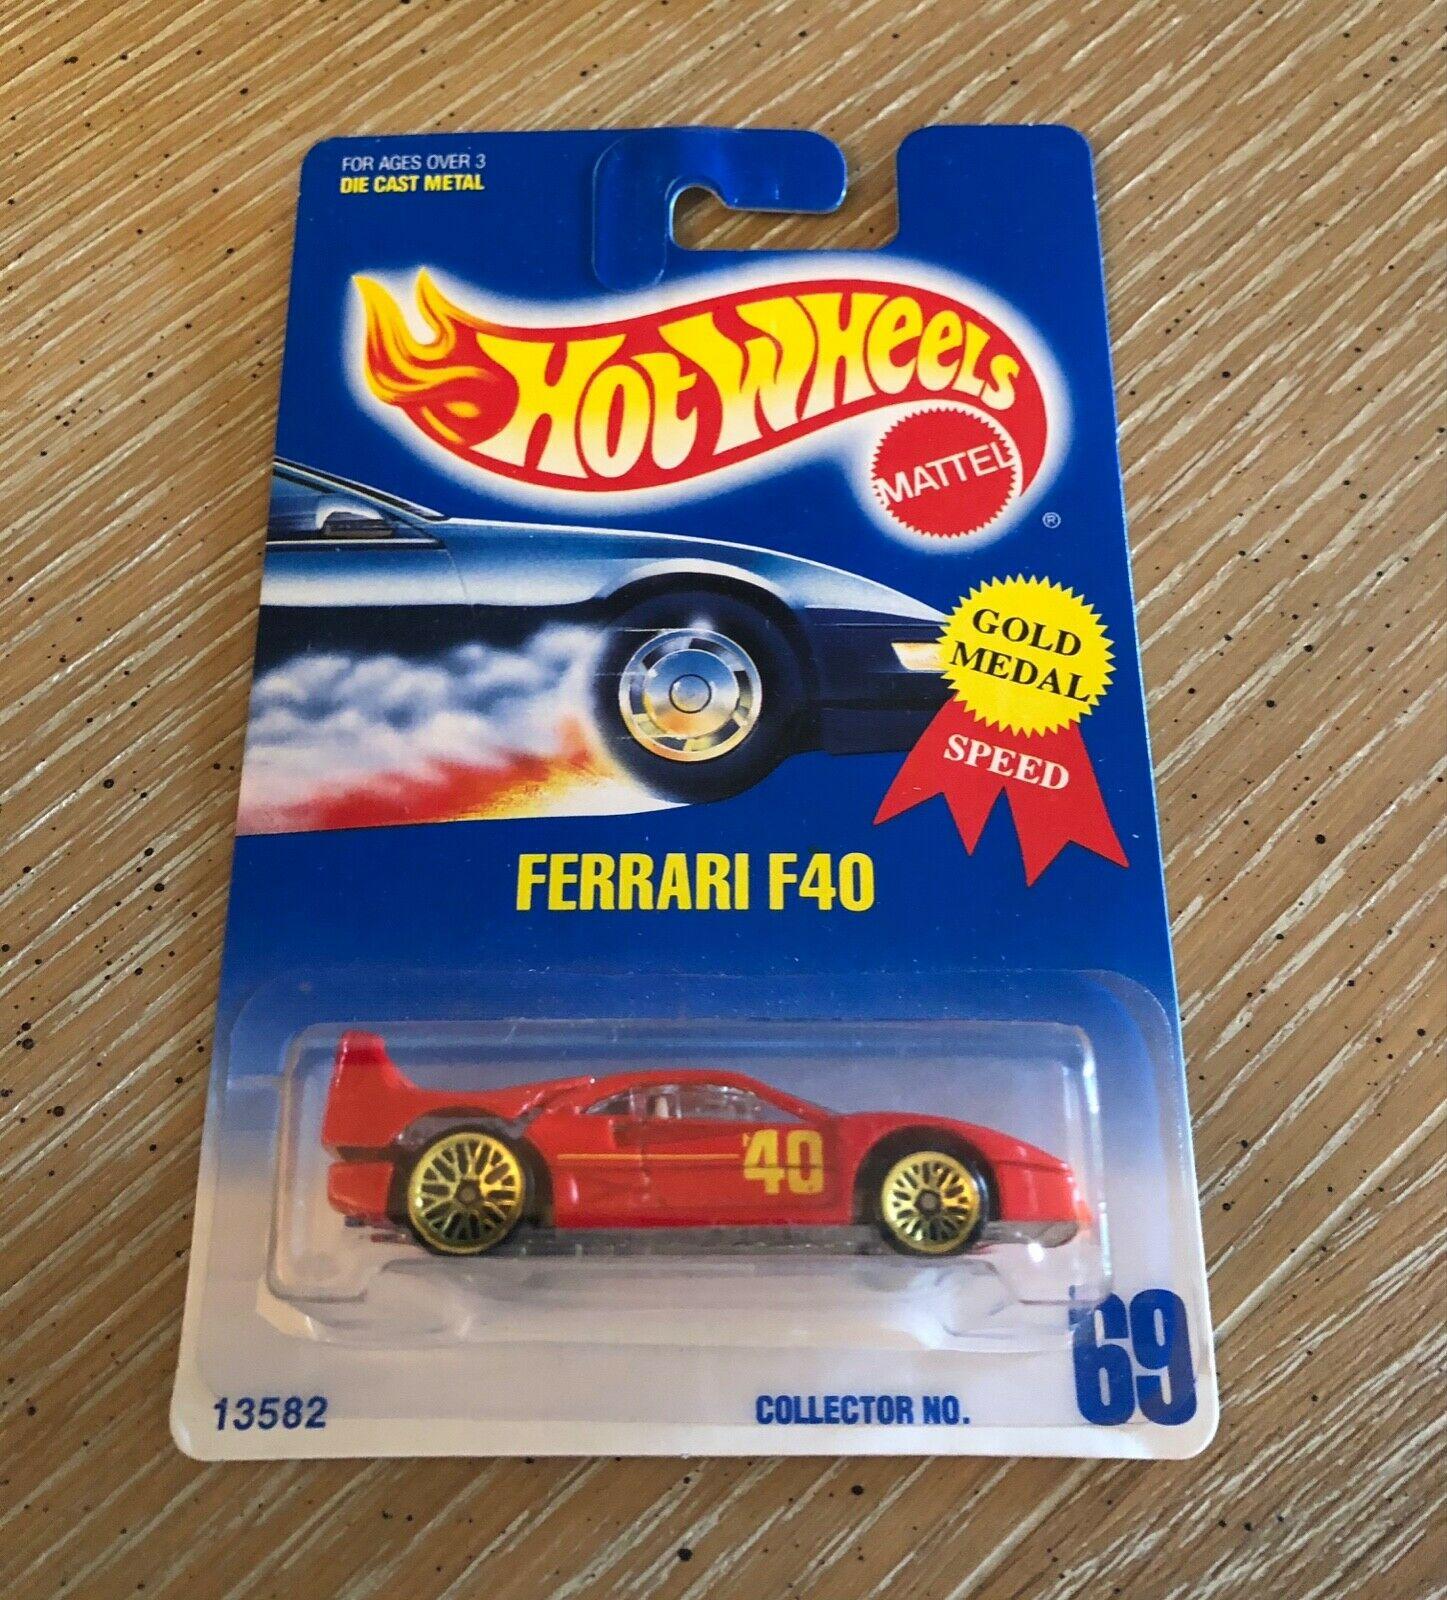 HOT WHEELS BOULEVARD FERRARI F40 1:64 Scale Premium Collectable Die-Cast Vehicle Car HARD TO FIND!!!